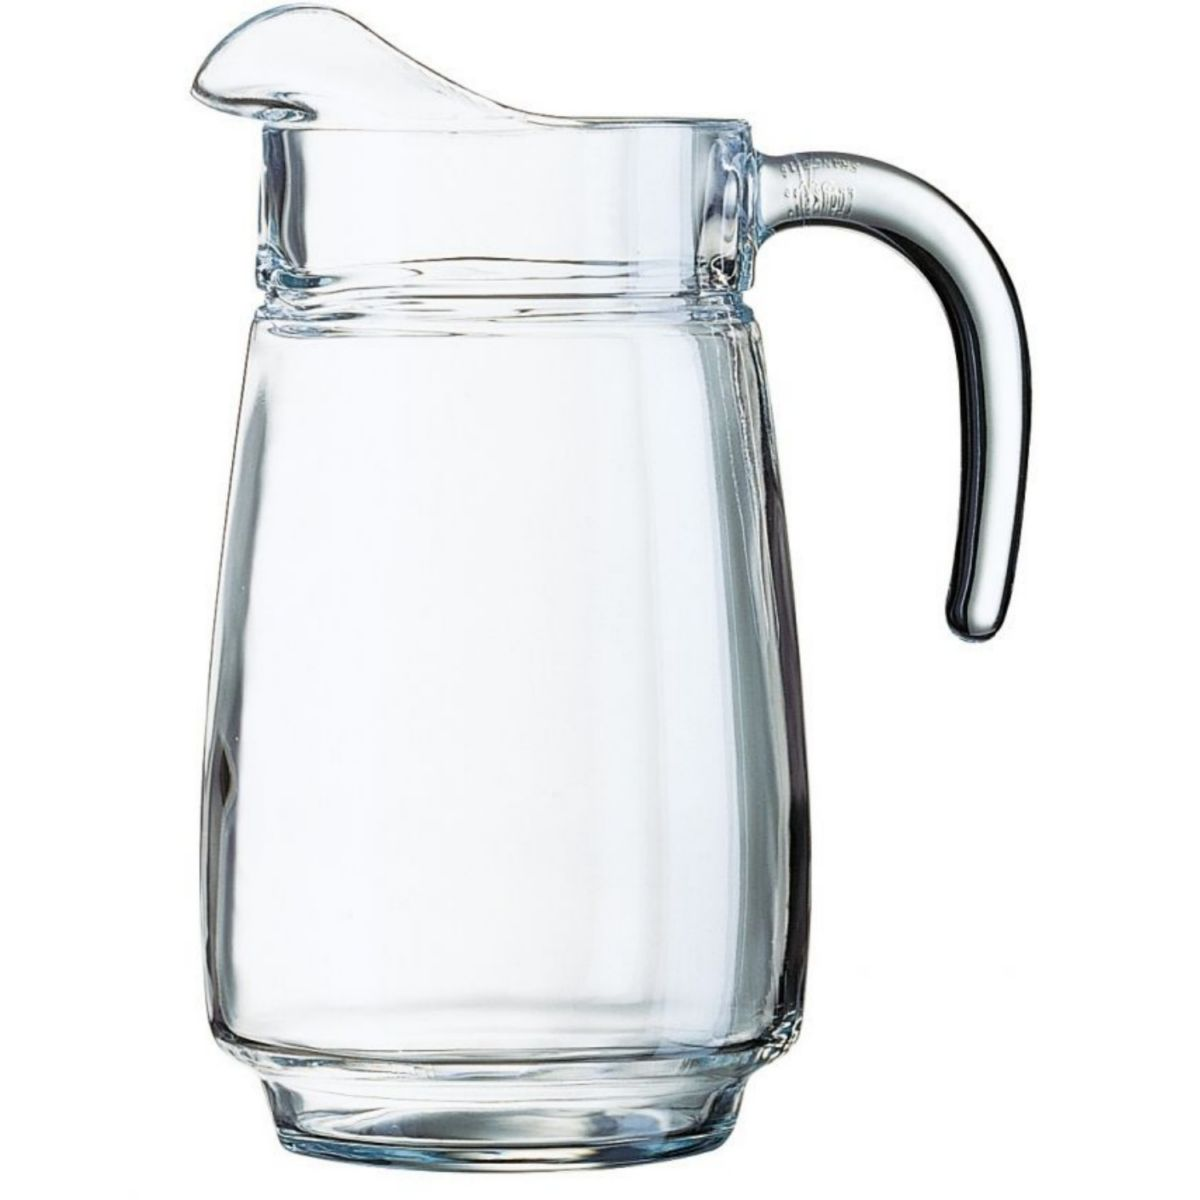 ARCOROC | TIVOLI džbán 2,3 l s brzdou na led